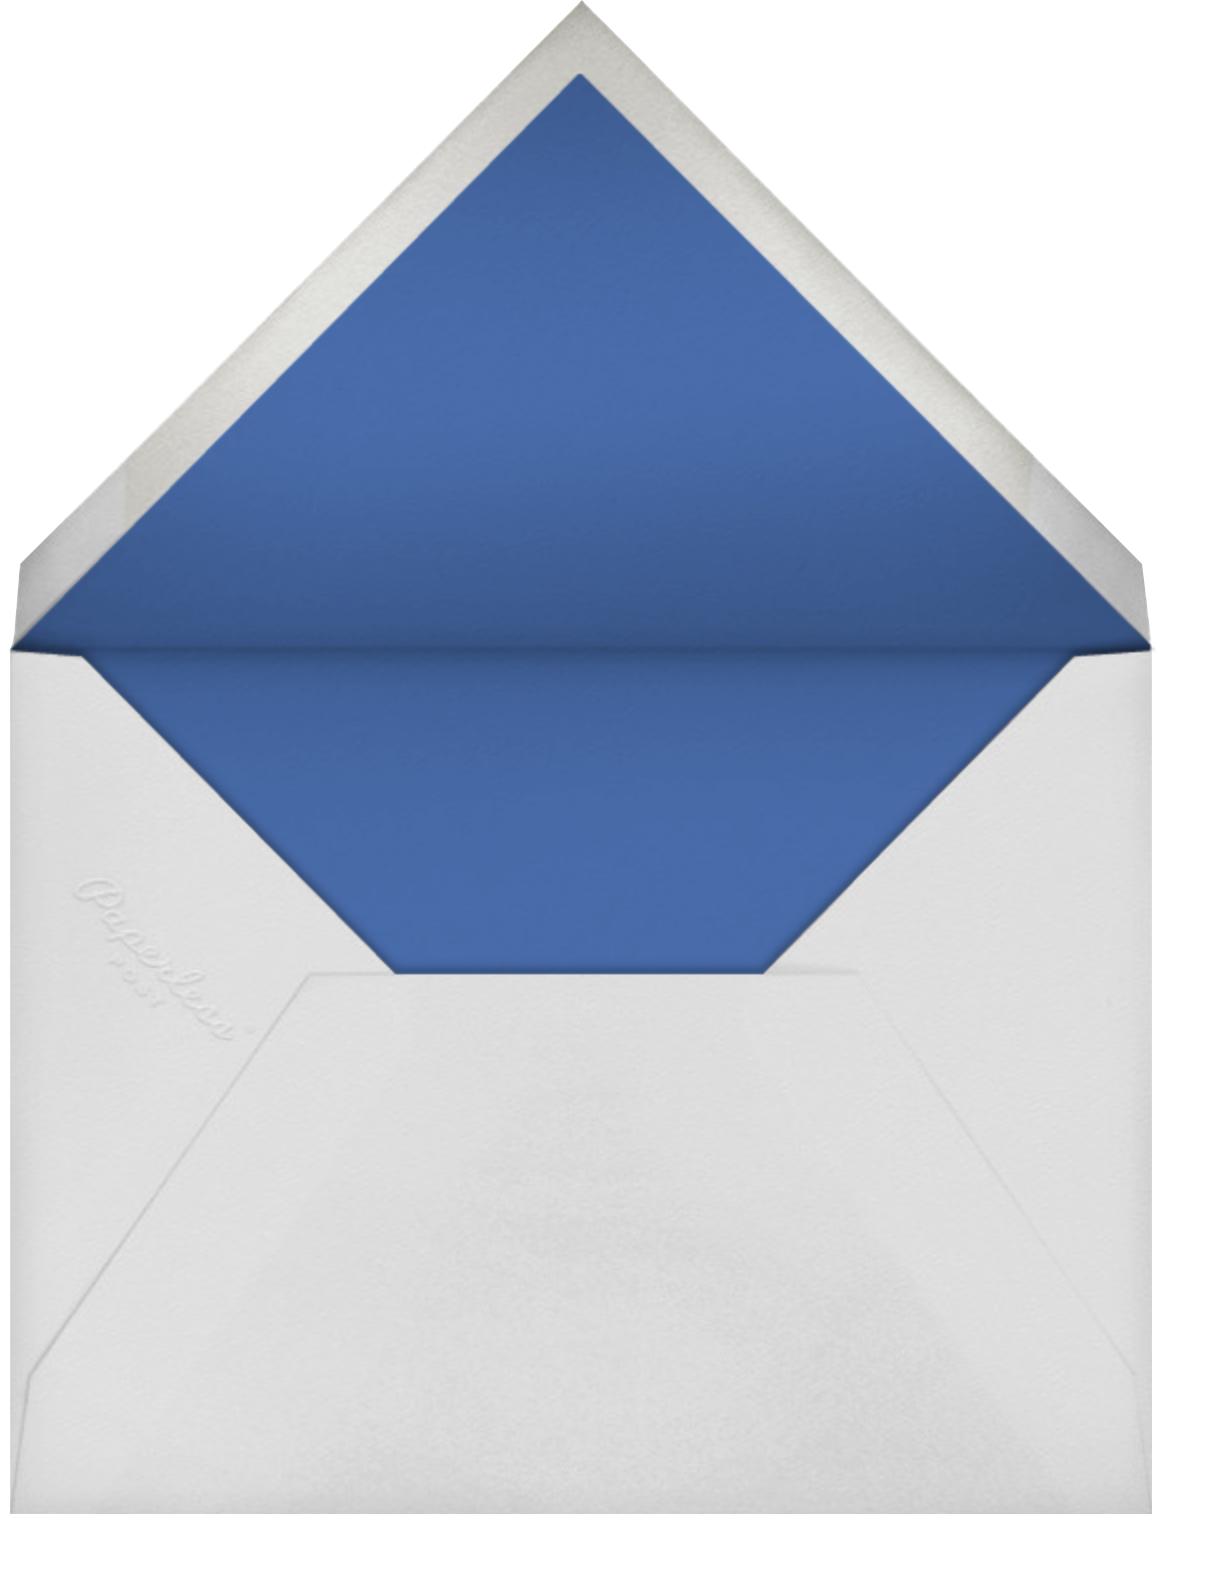 Standish (Thank You) - Regent Blue - Crane & Co. - Wedding stationery - envelope back